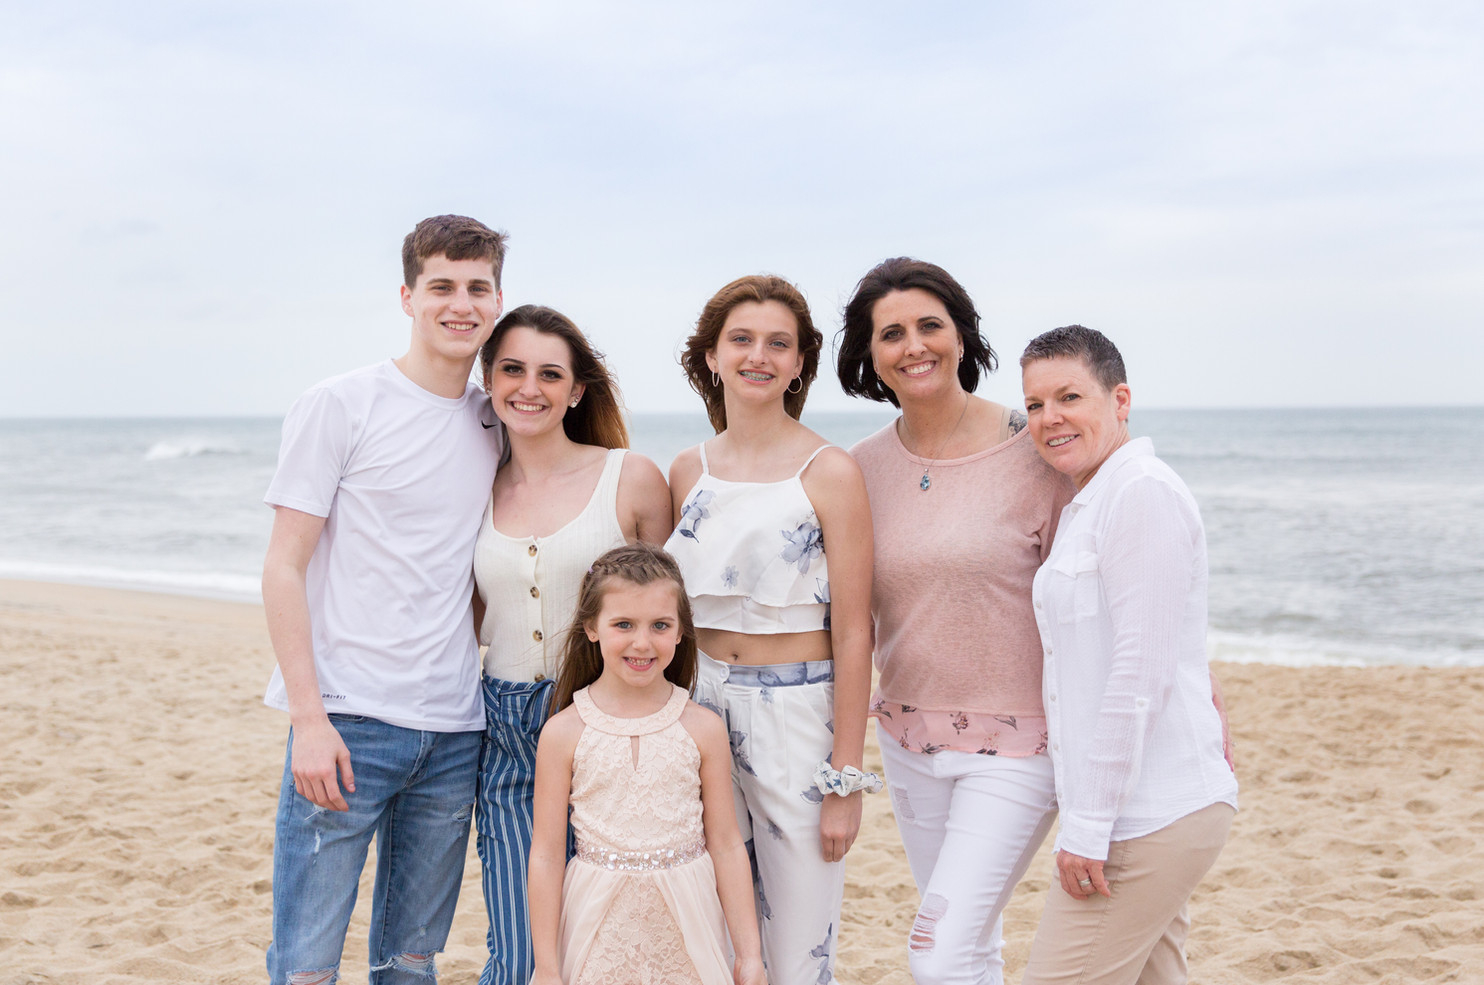 NC-Beach-Reunion-2019-209.jpg